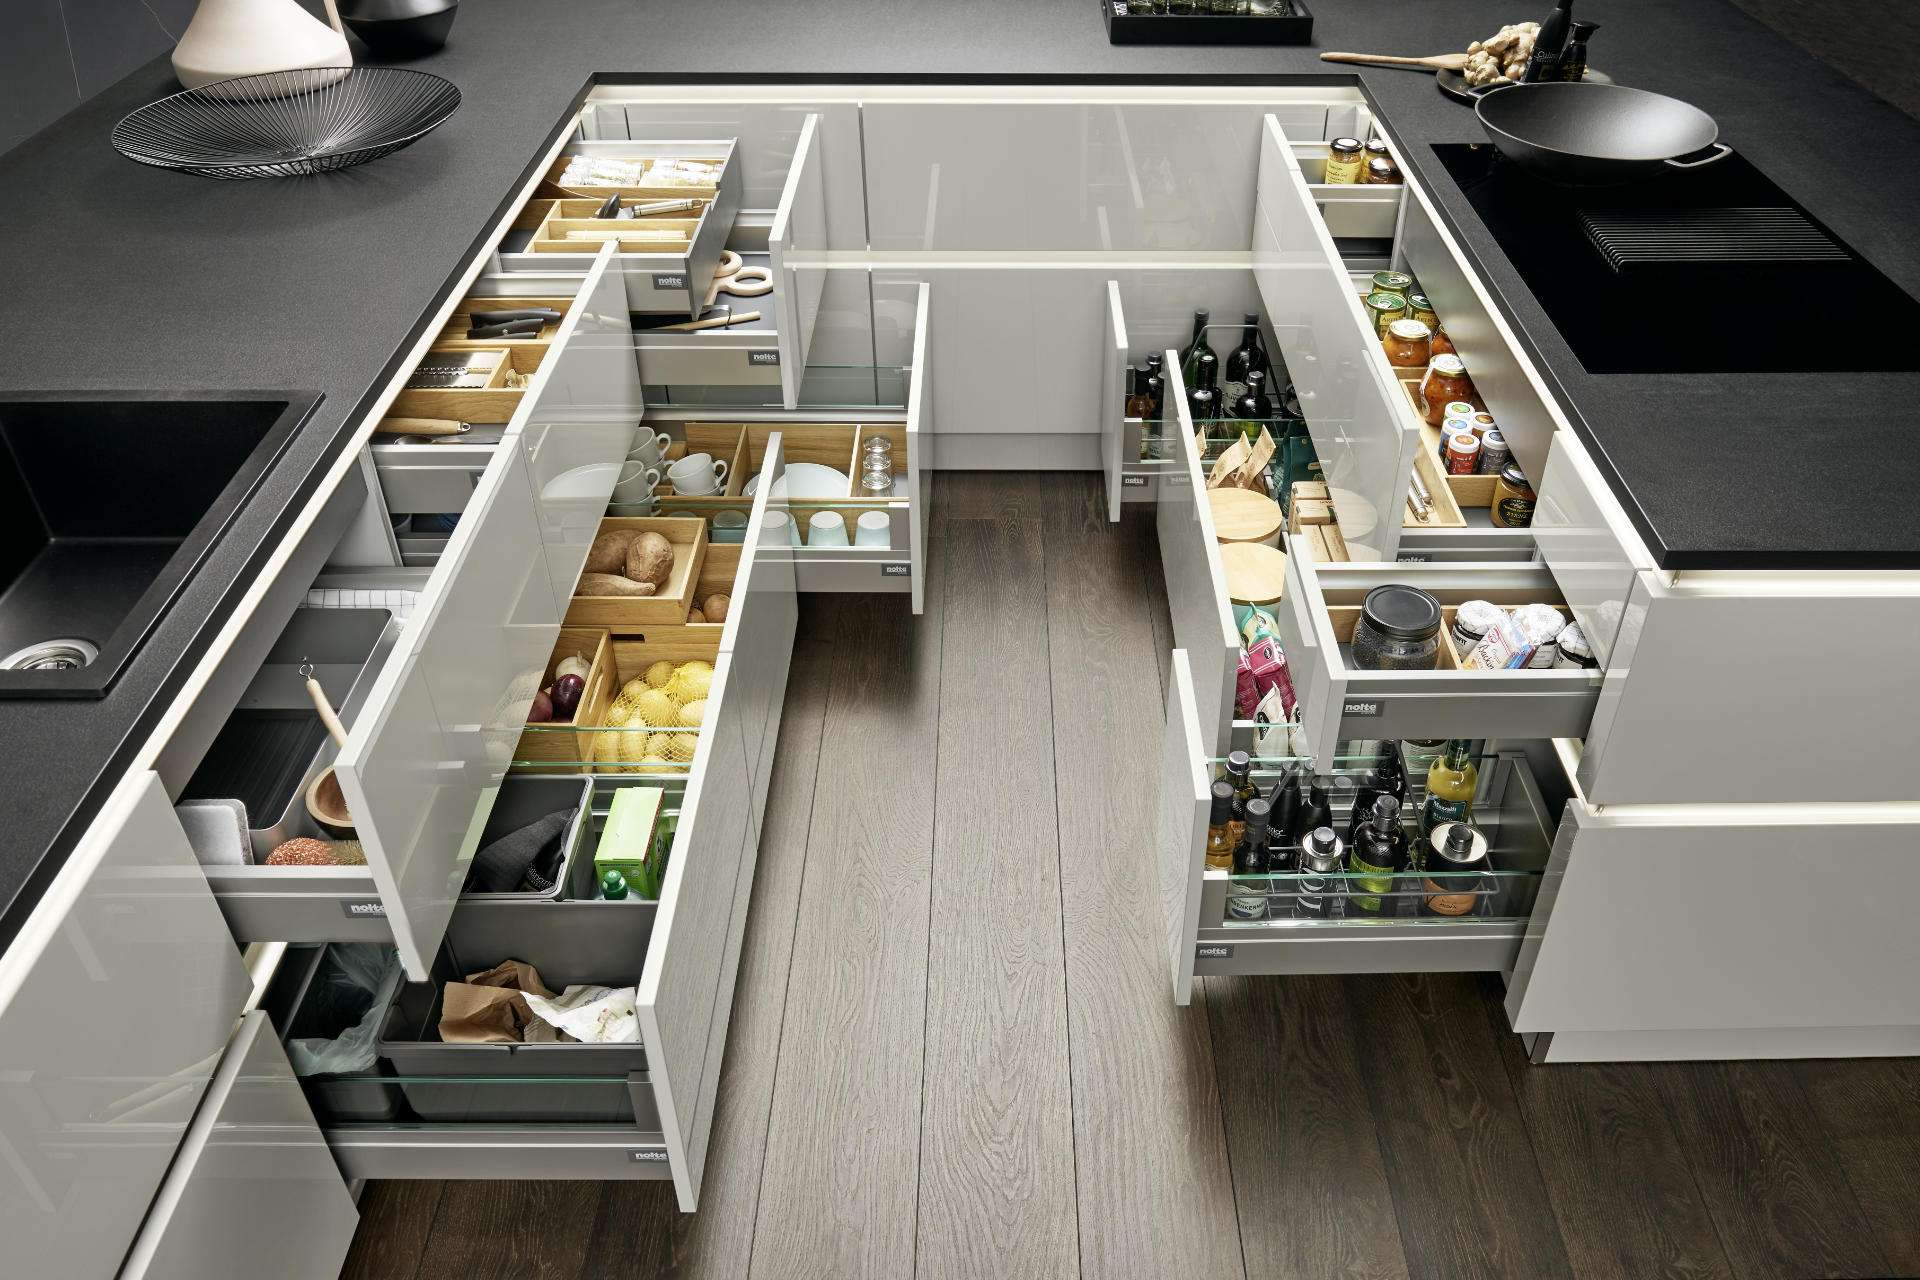 Rangements de cuisine tiroir NOLTE